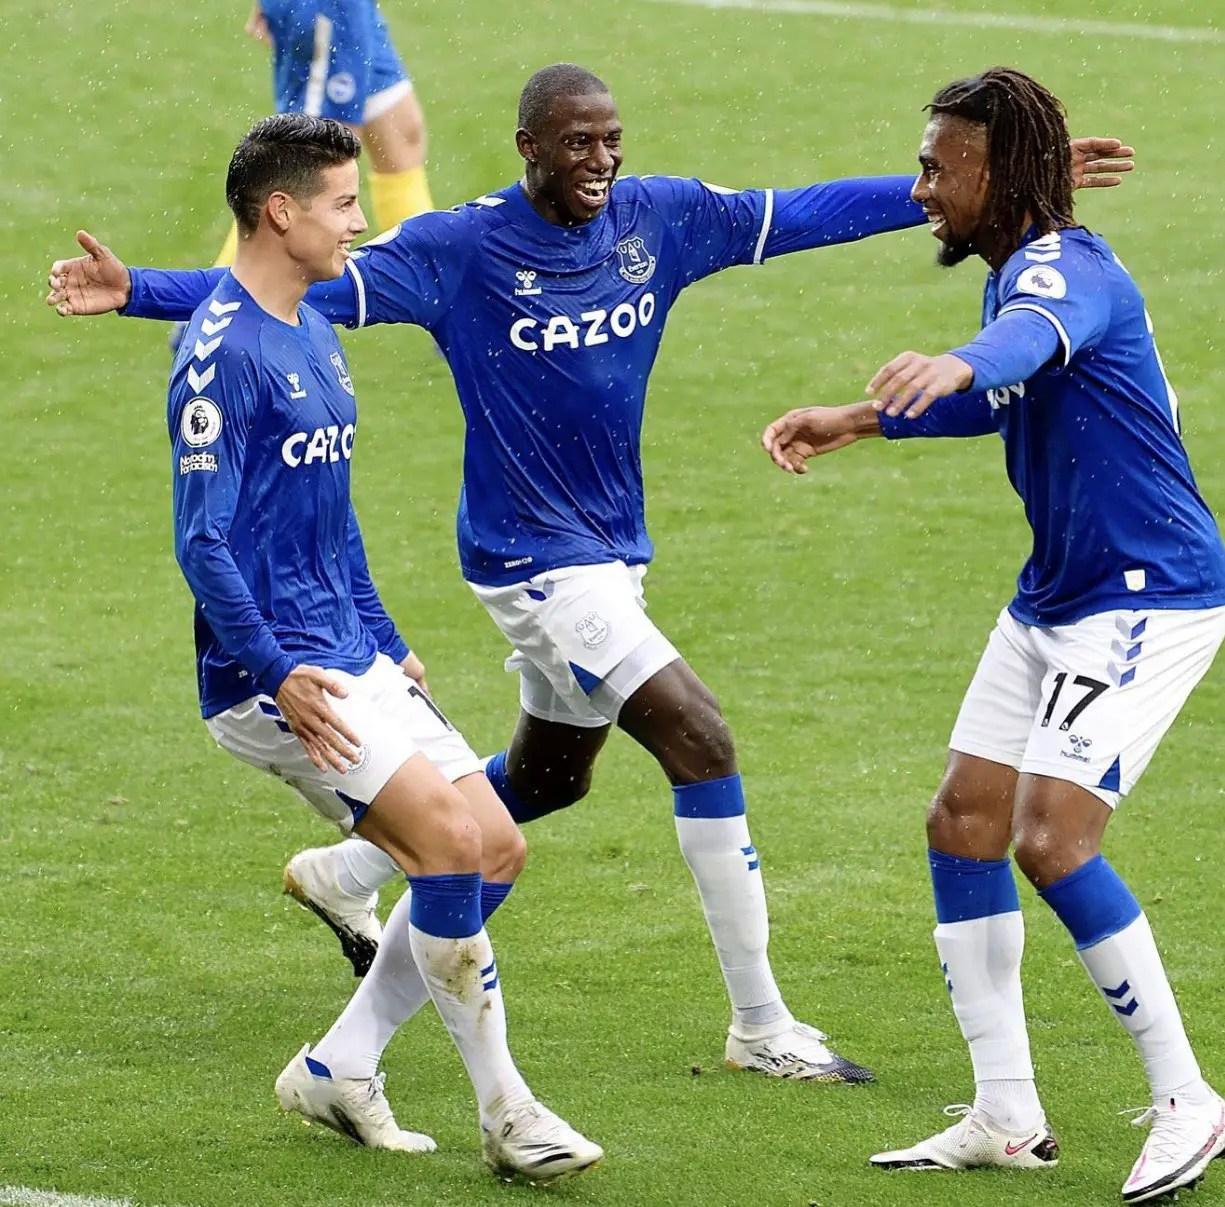 FA Cup: Iwobi Shines In Everton's Nine-Goal Thriller Win Vs Tottenham Hotspur